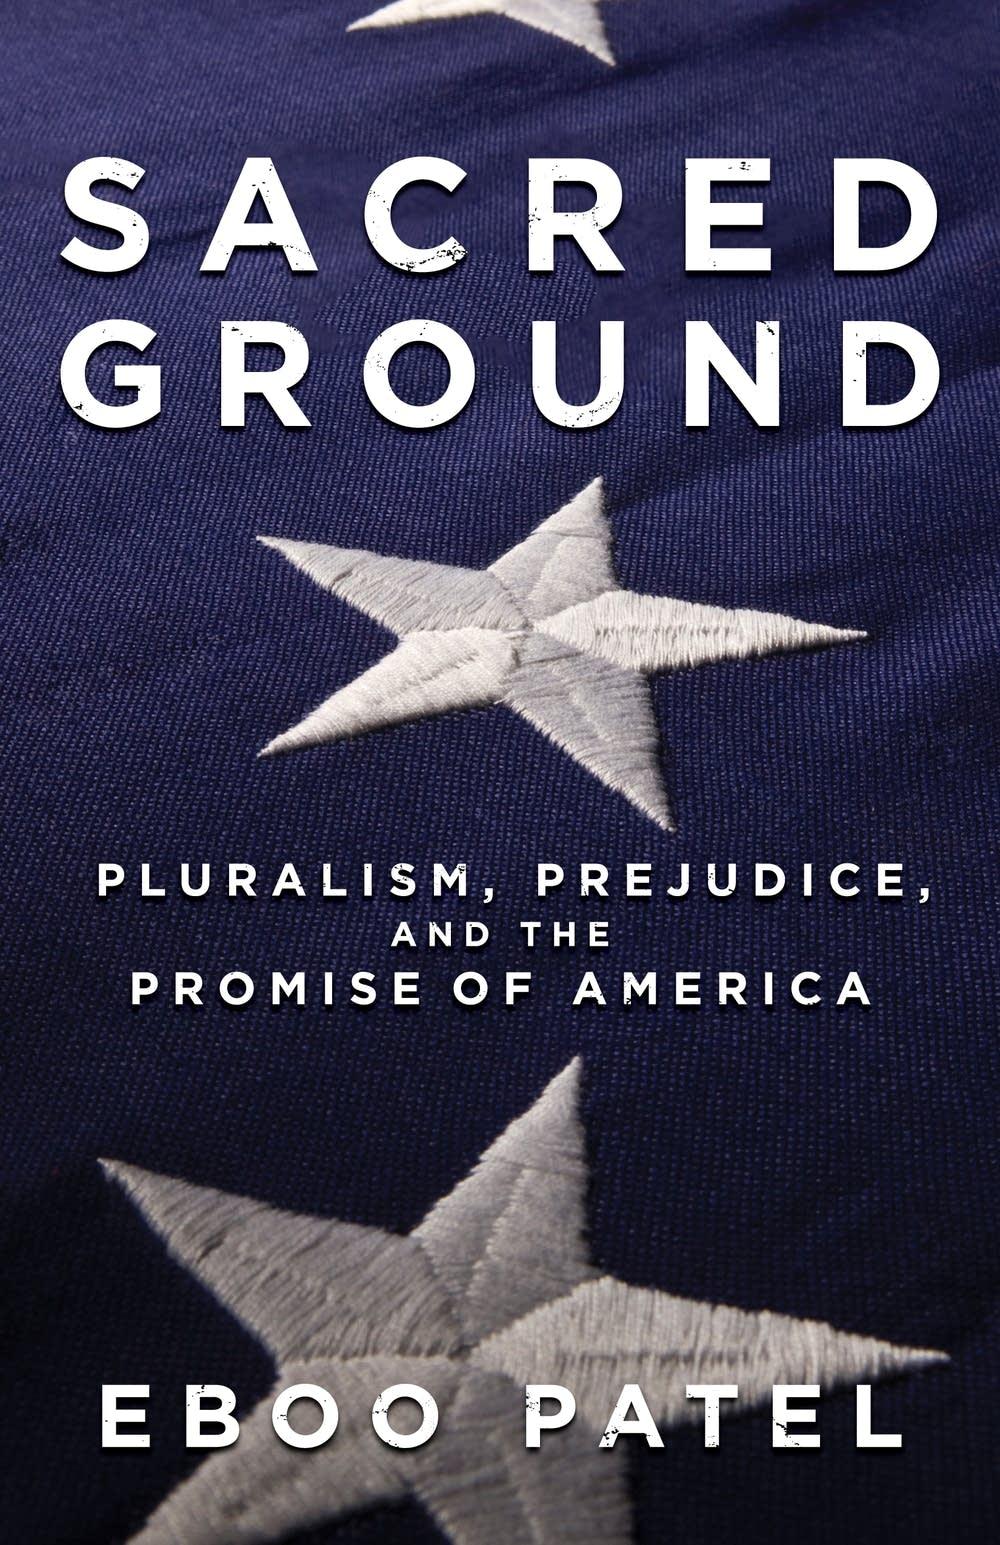 'Sacred Ground' by Eboo Patel